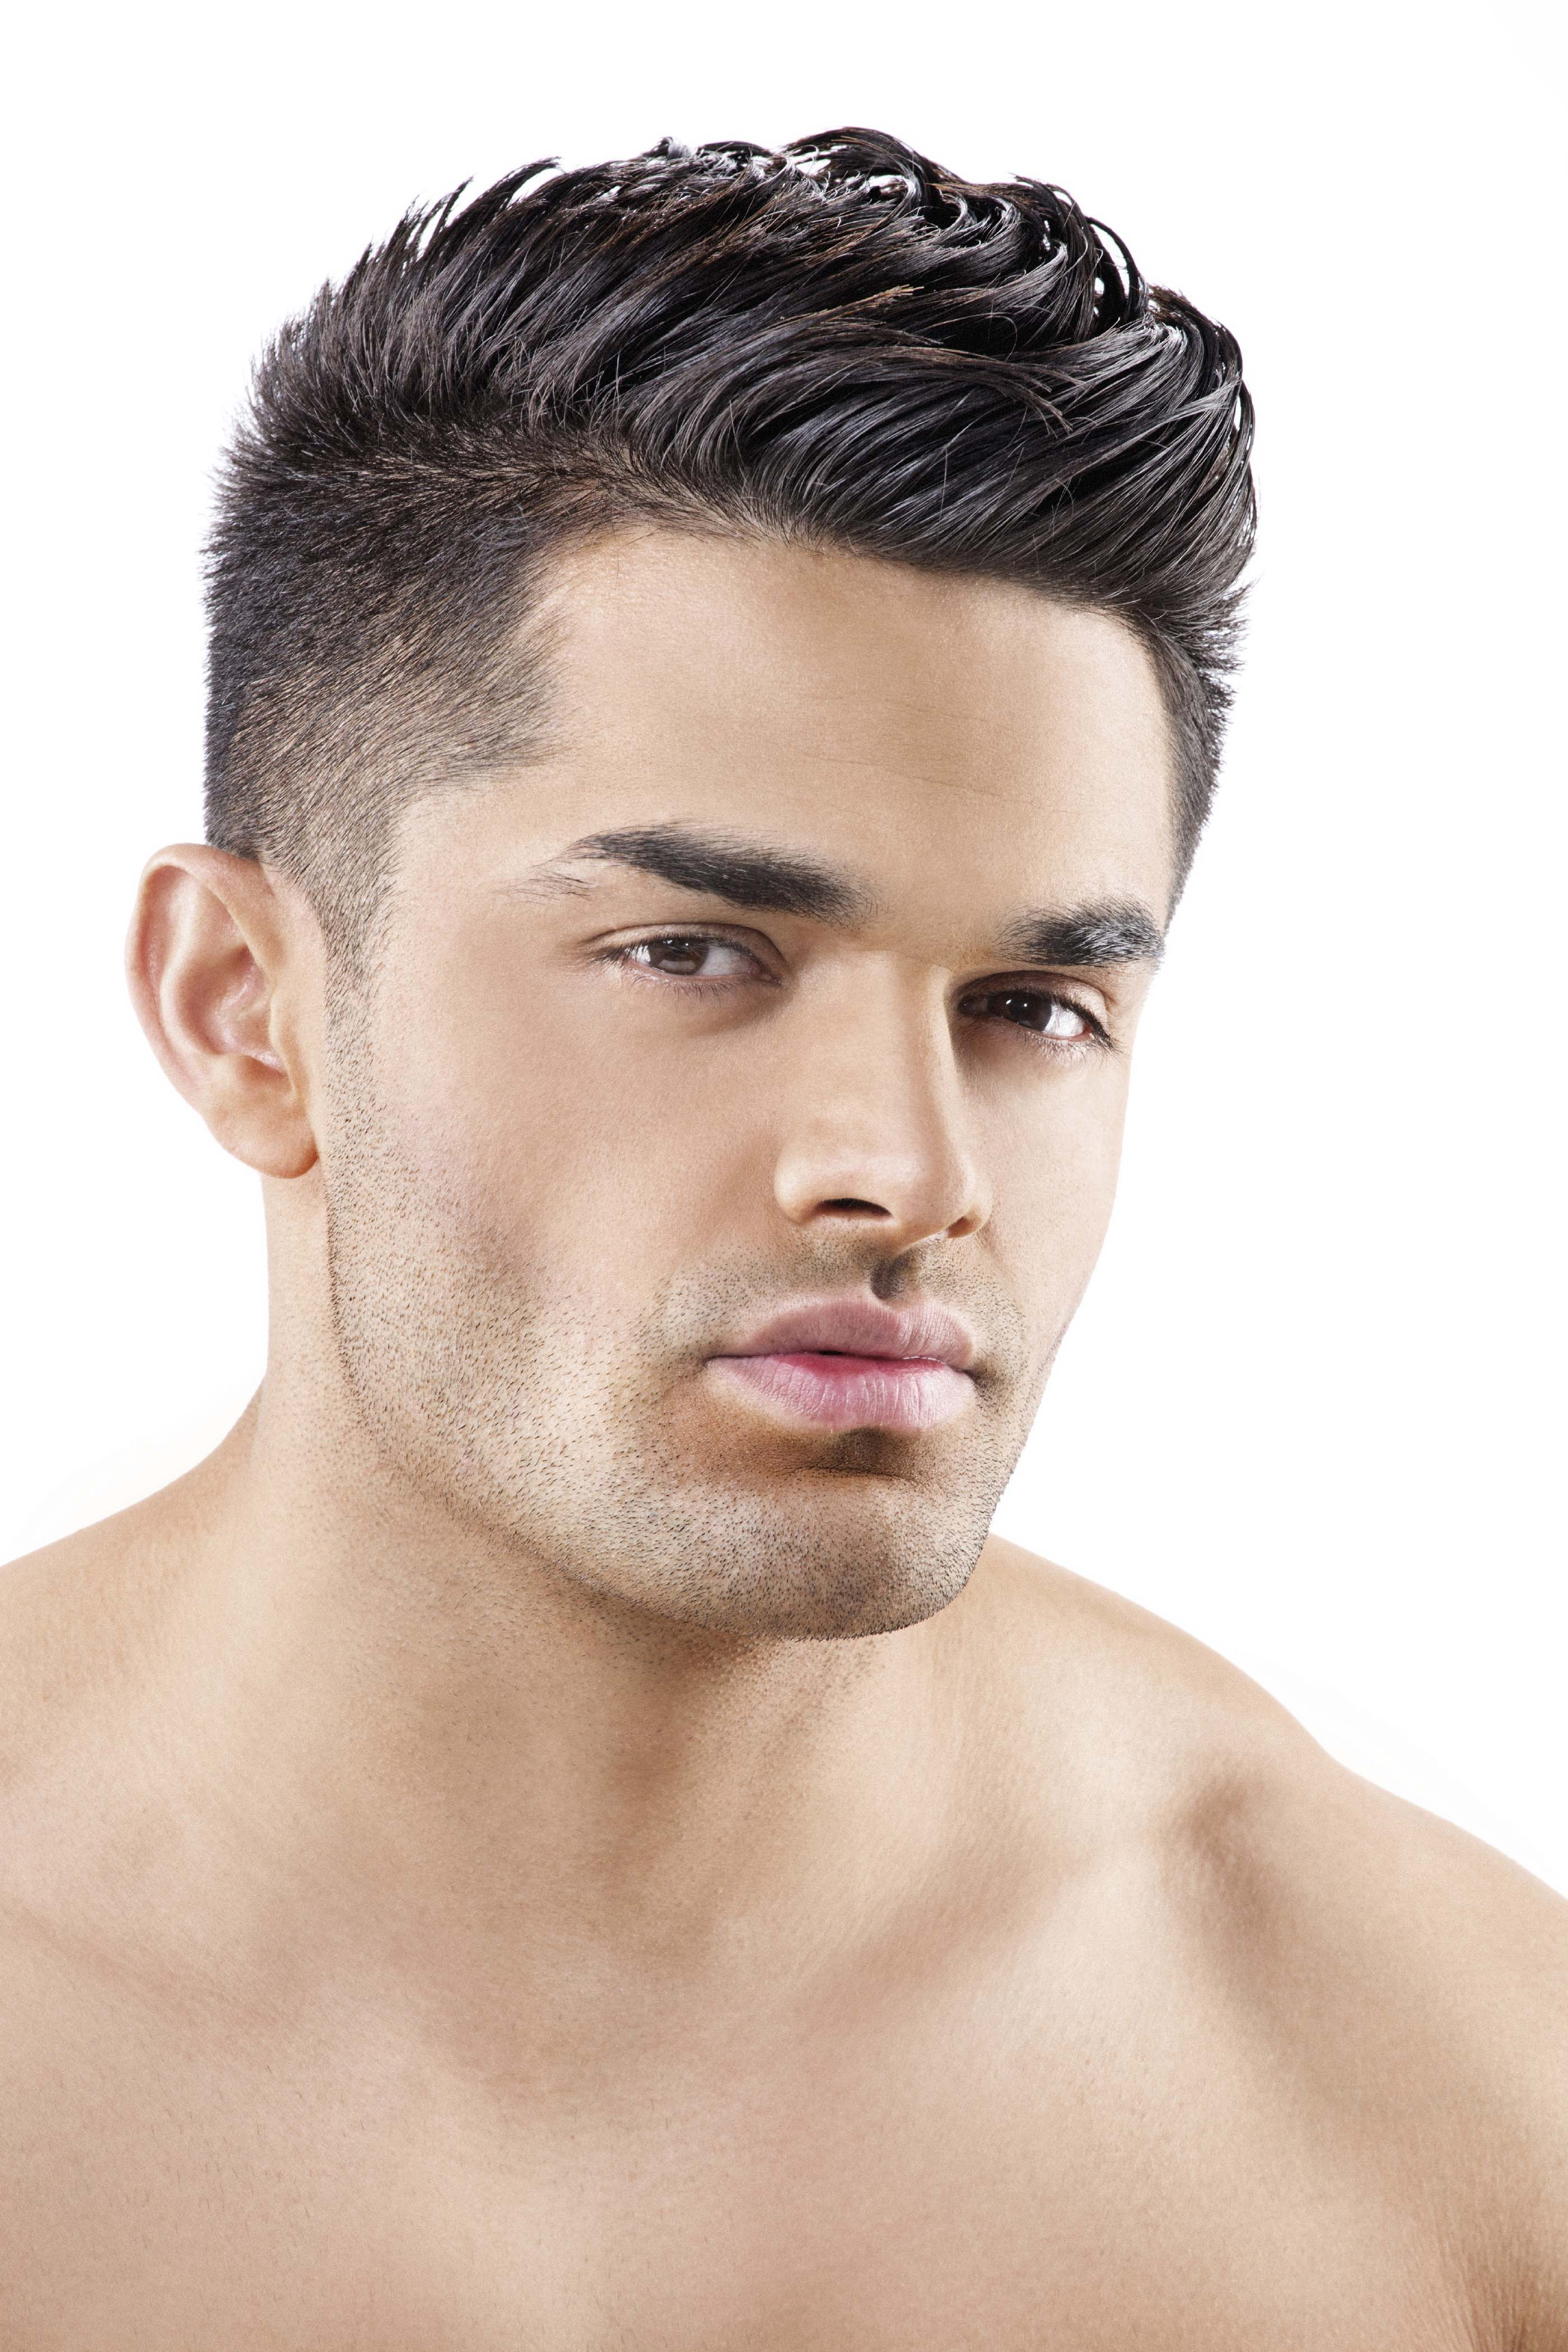 10 Ideas Del Corte De Pelo Degradado Para Hombre All Things Hair - Hombre-pelo